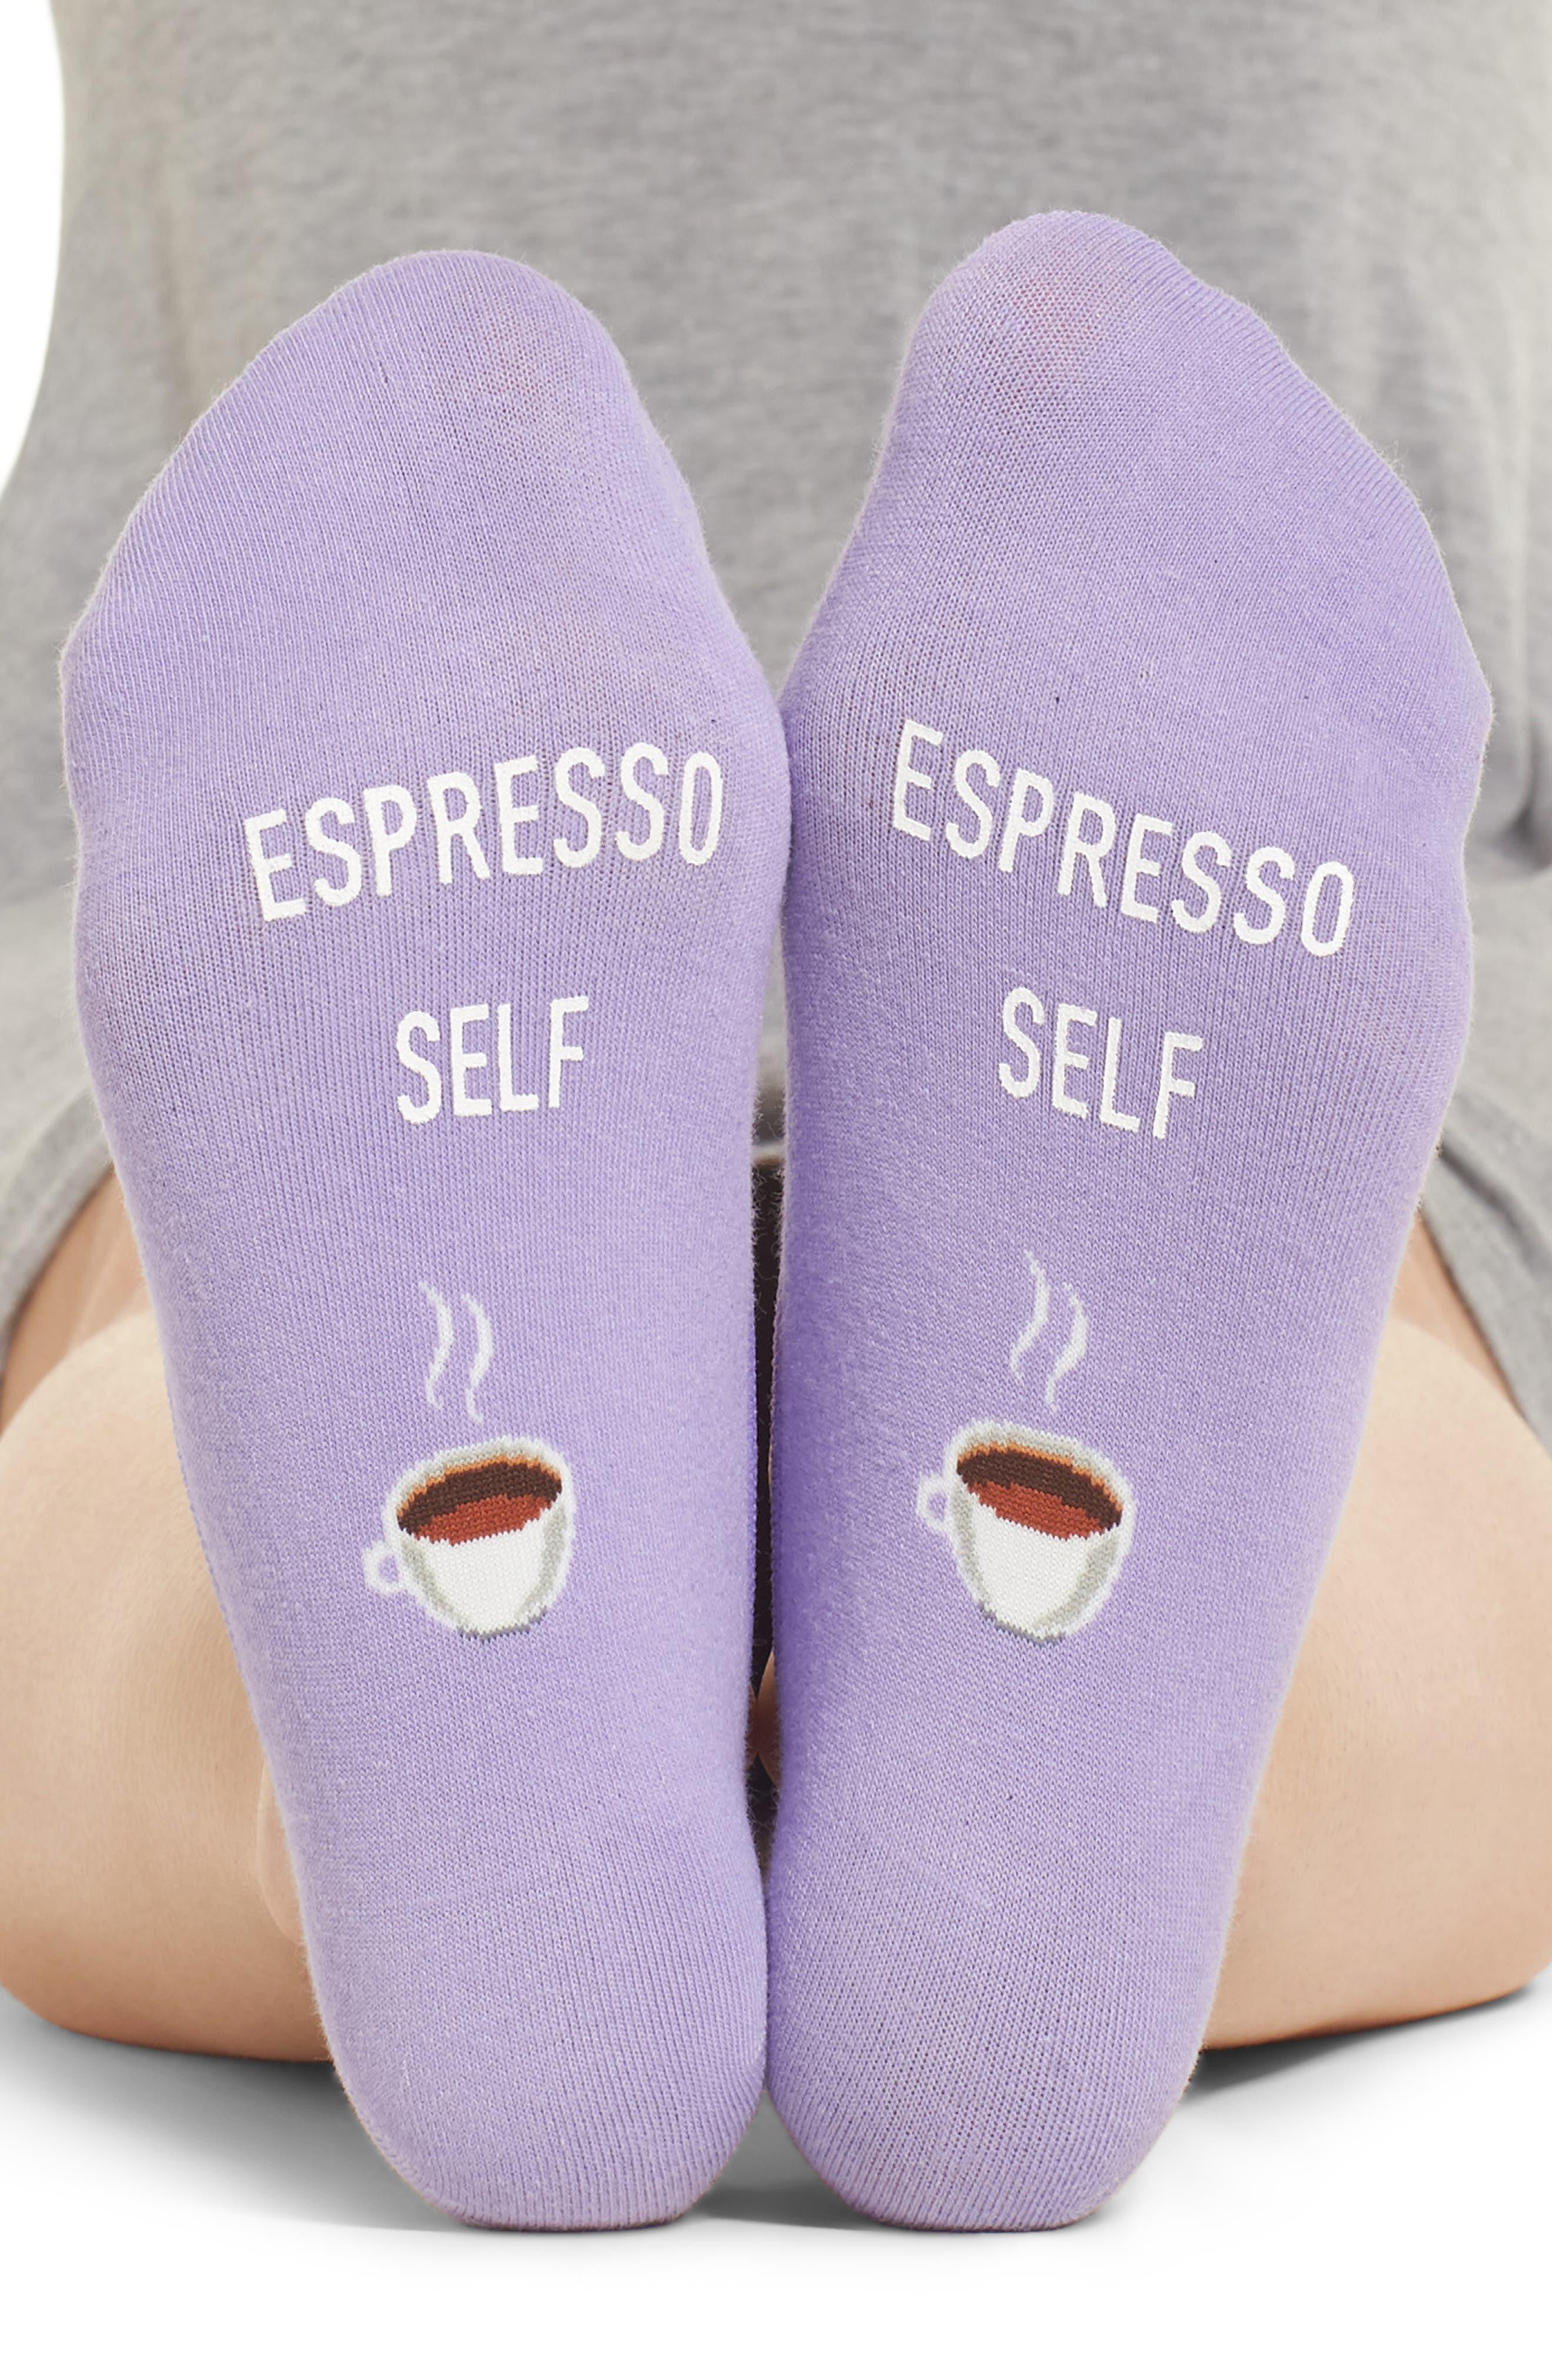 Espresso Self No-Show Socks,                             Alternate thumbnail 3, color,                             536